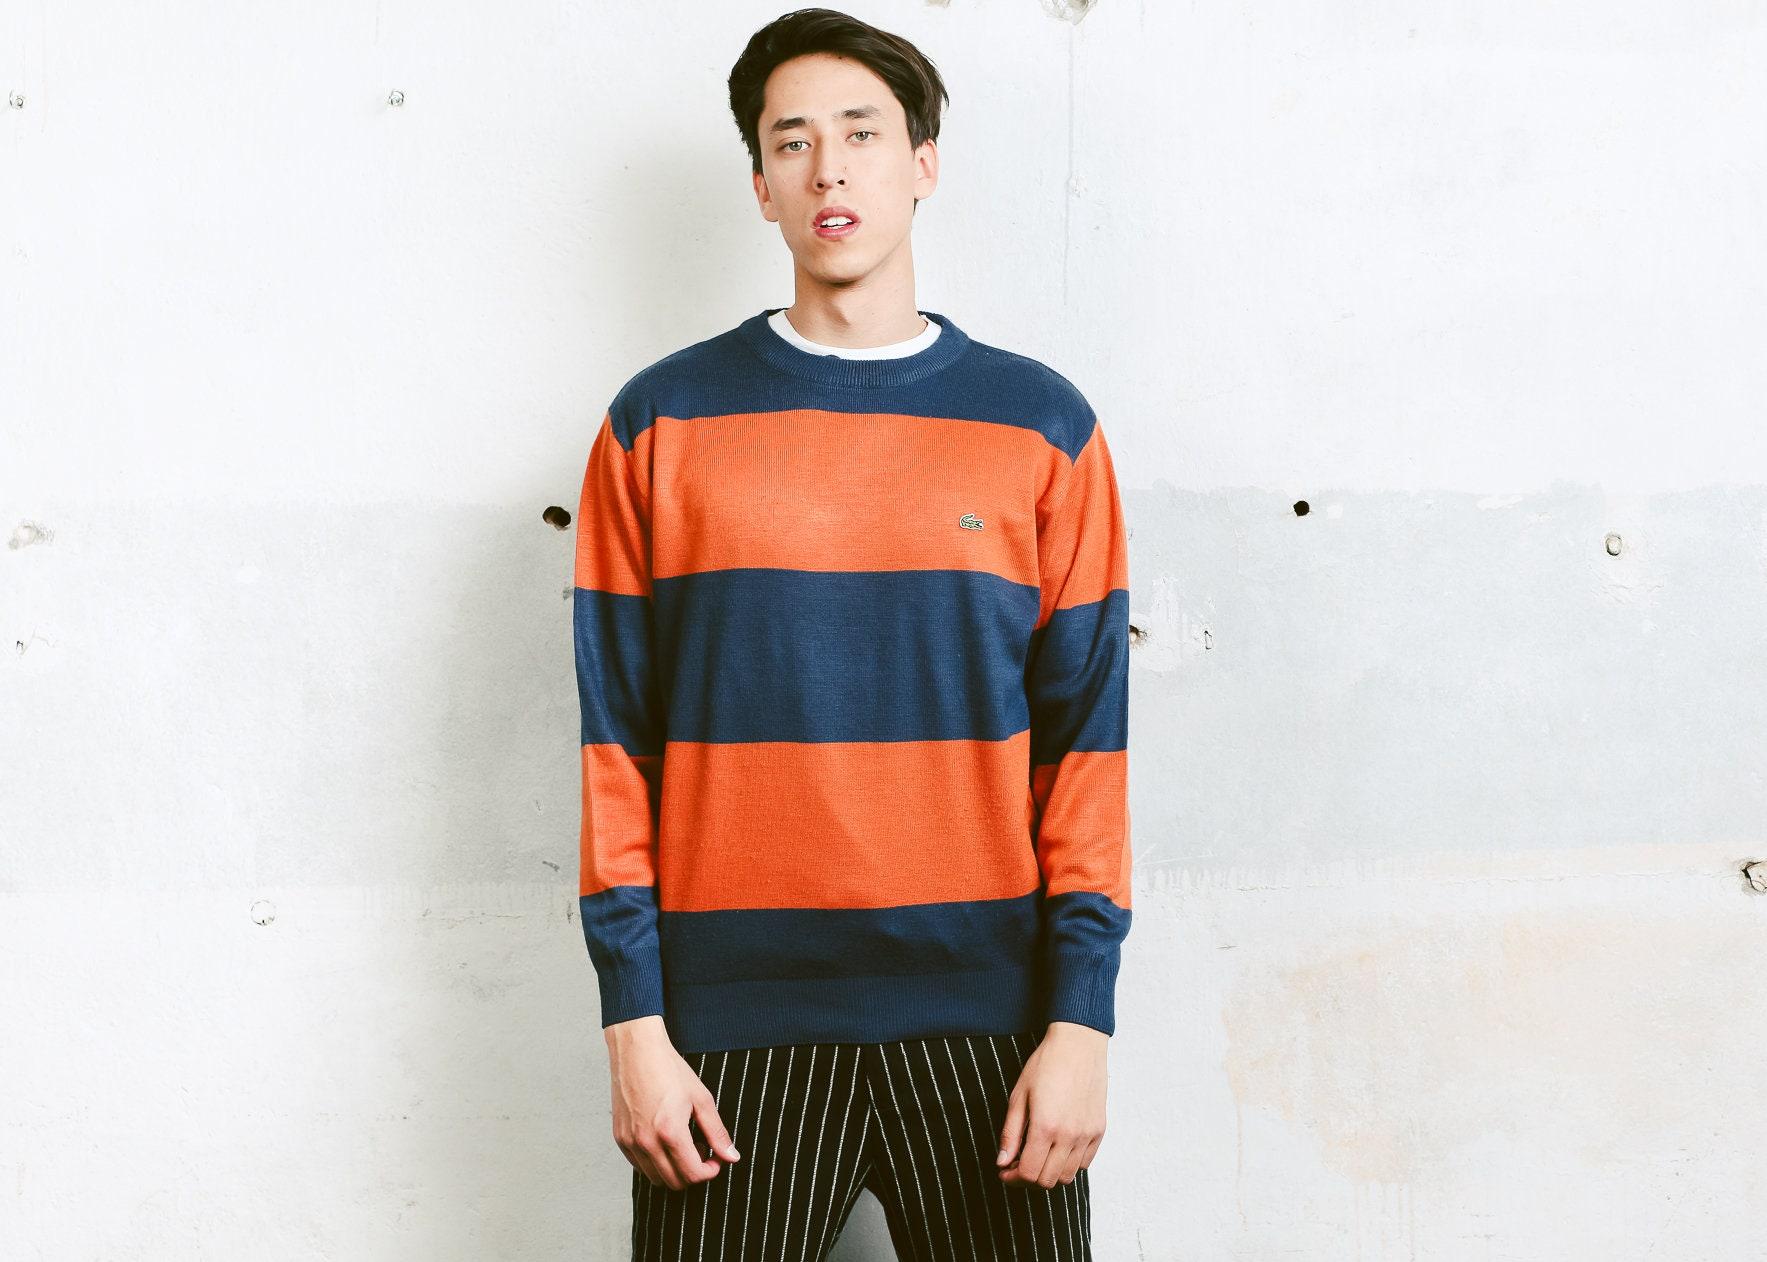 1739e3796d30 Striped Lacoste Sweater . Vintage Blue and Orange 90s Sweatshirt ...